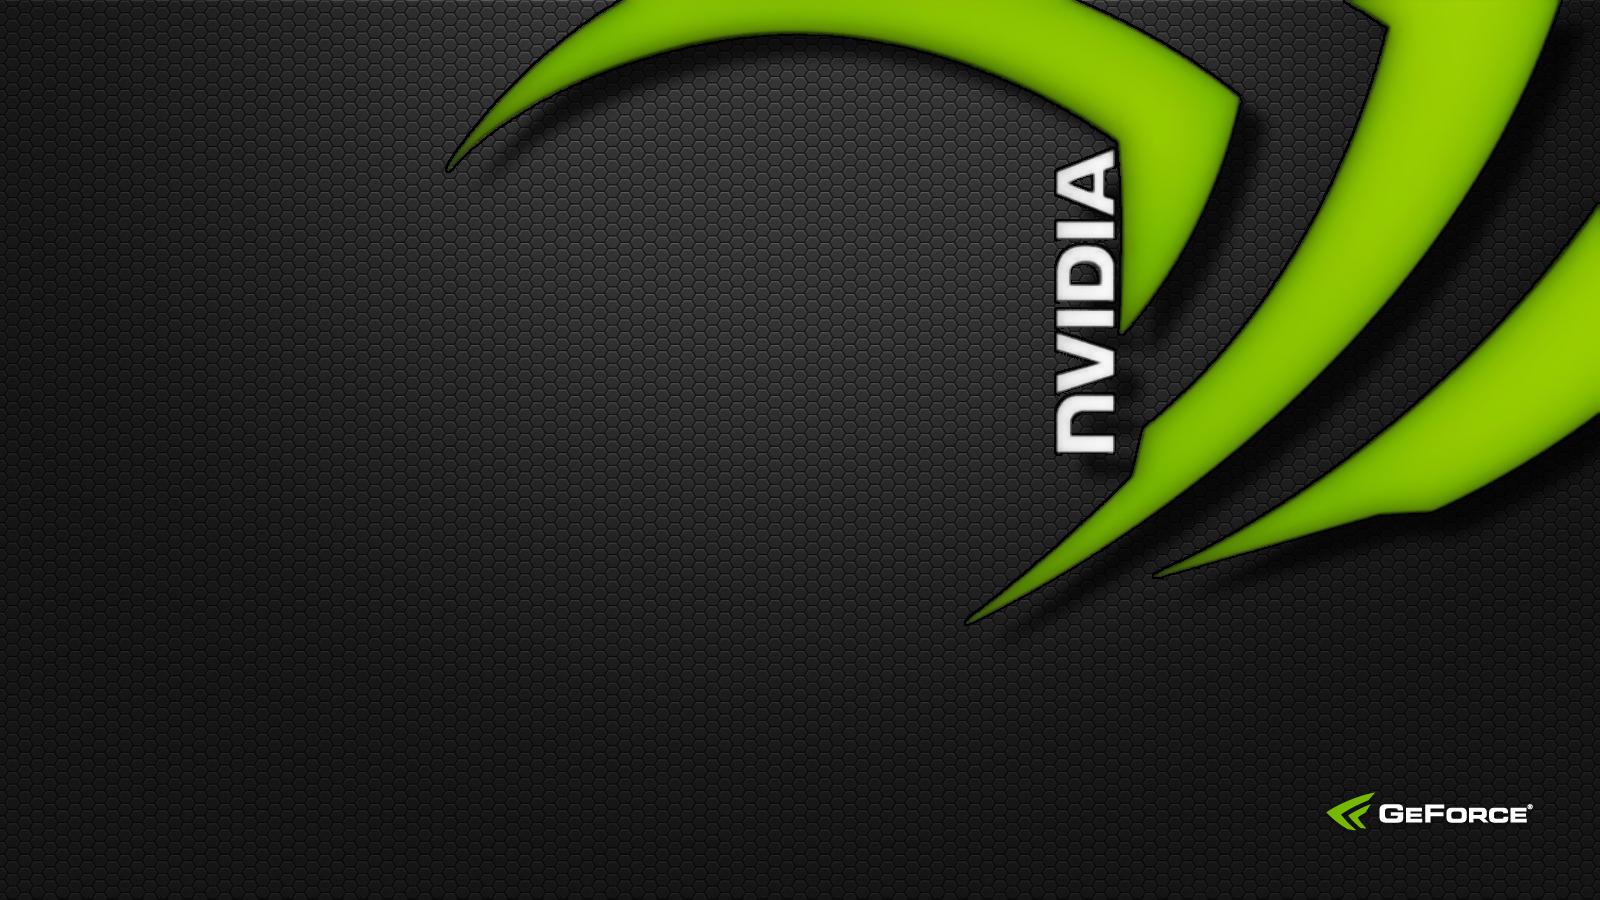 nvidia wallpaper ultra - photo #11